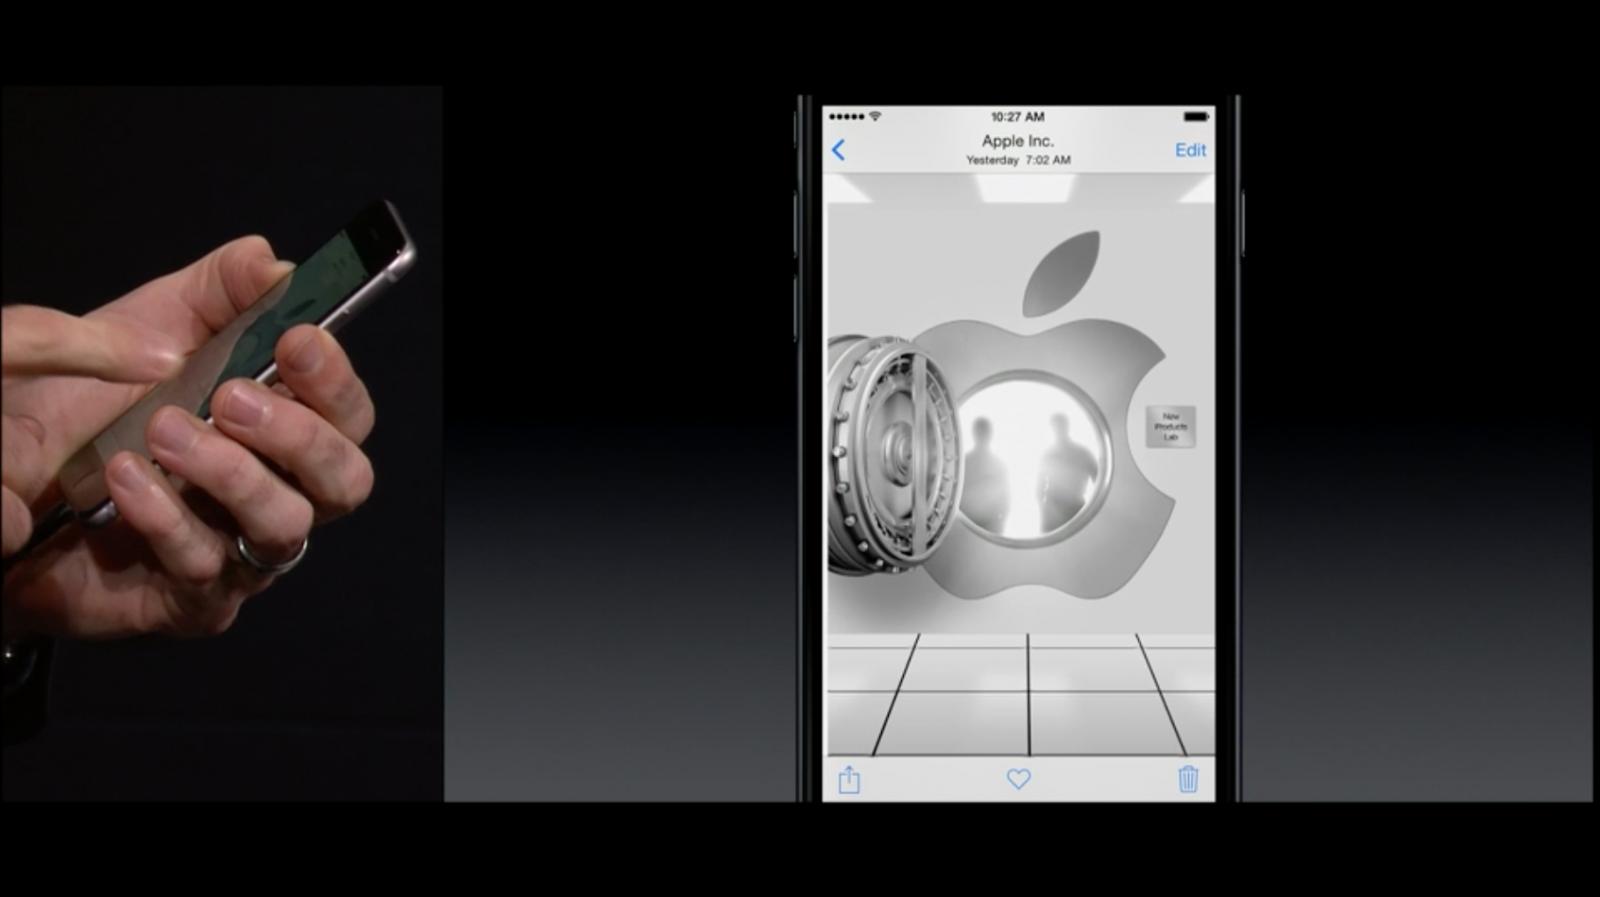 Apple Continuity iPAd Event